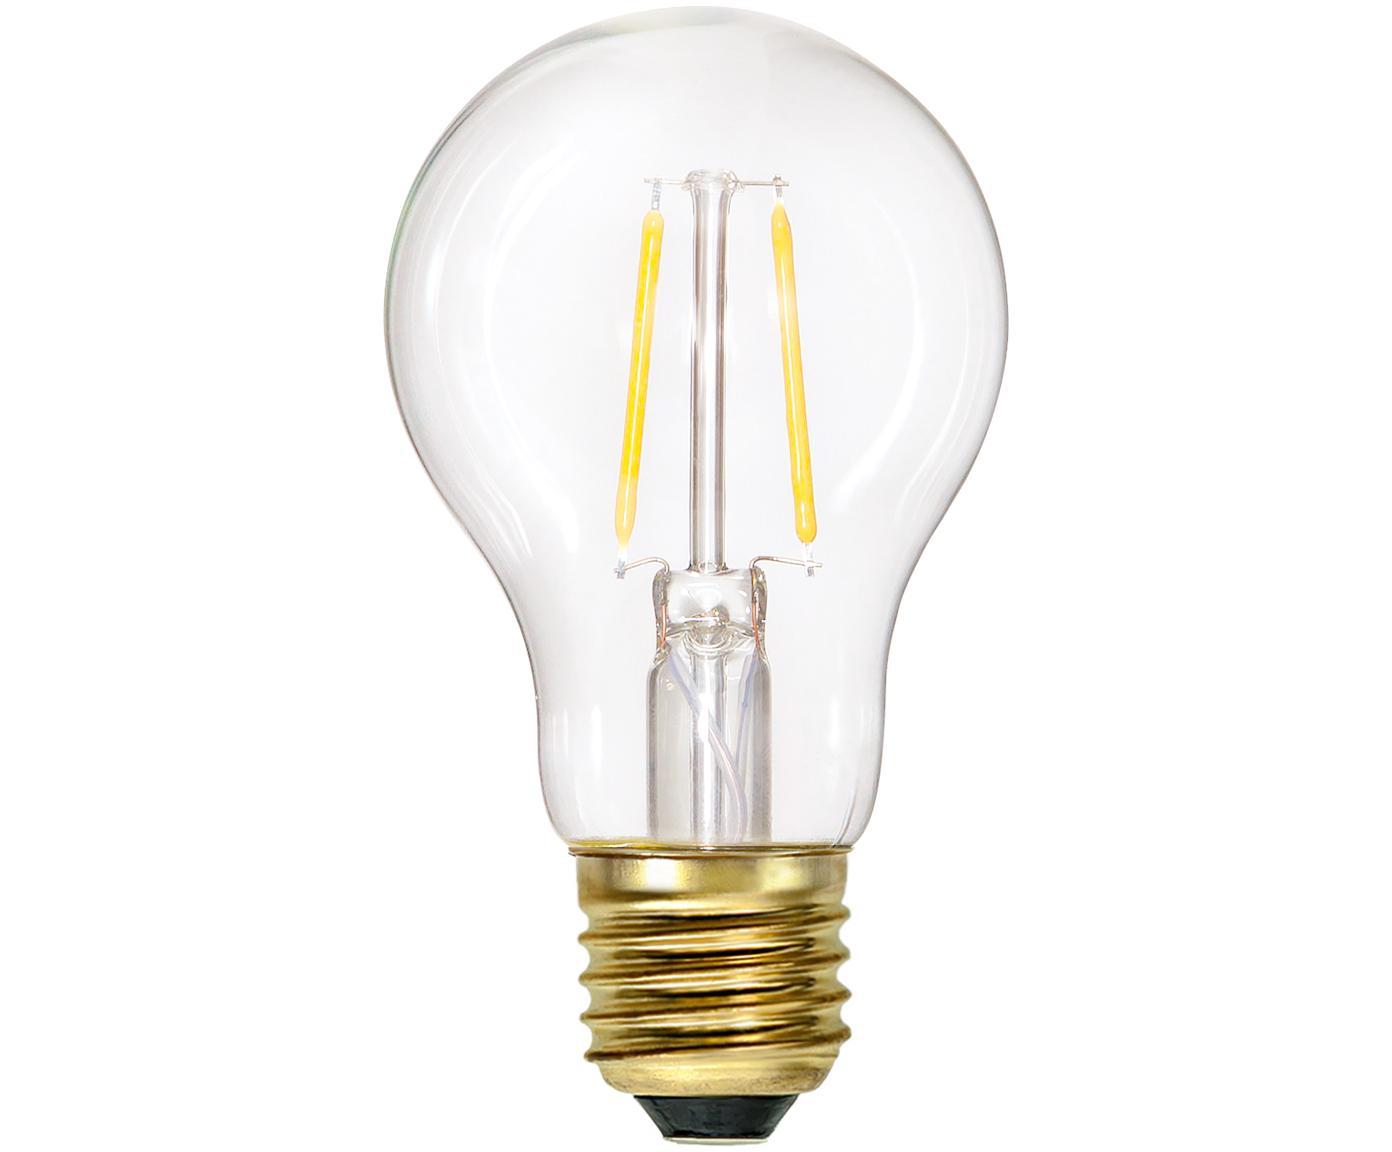 Lampadina a LED Airtight Stream (E27 / 1,6Watt), Paralume: Vetro, Base lampadina: ottone, Trasparente, ottone, Ø 6 x Alt. 11 cm